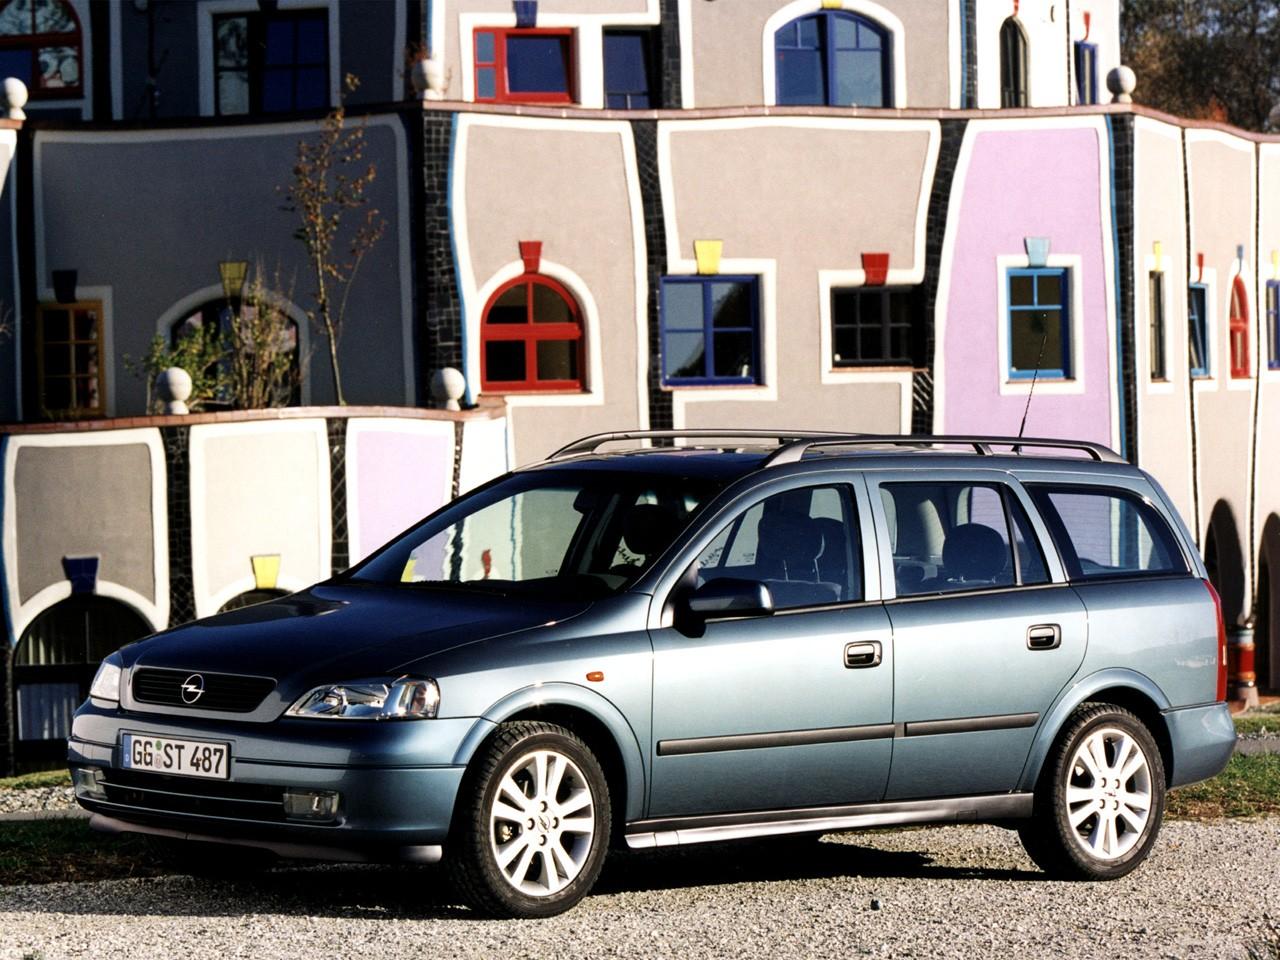 ... OPEL Astra Caravan (1998 - 2004) ...